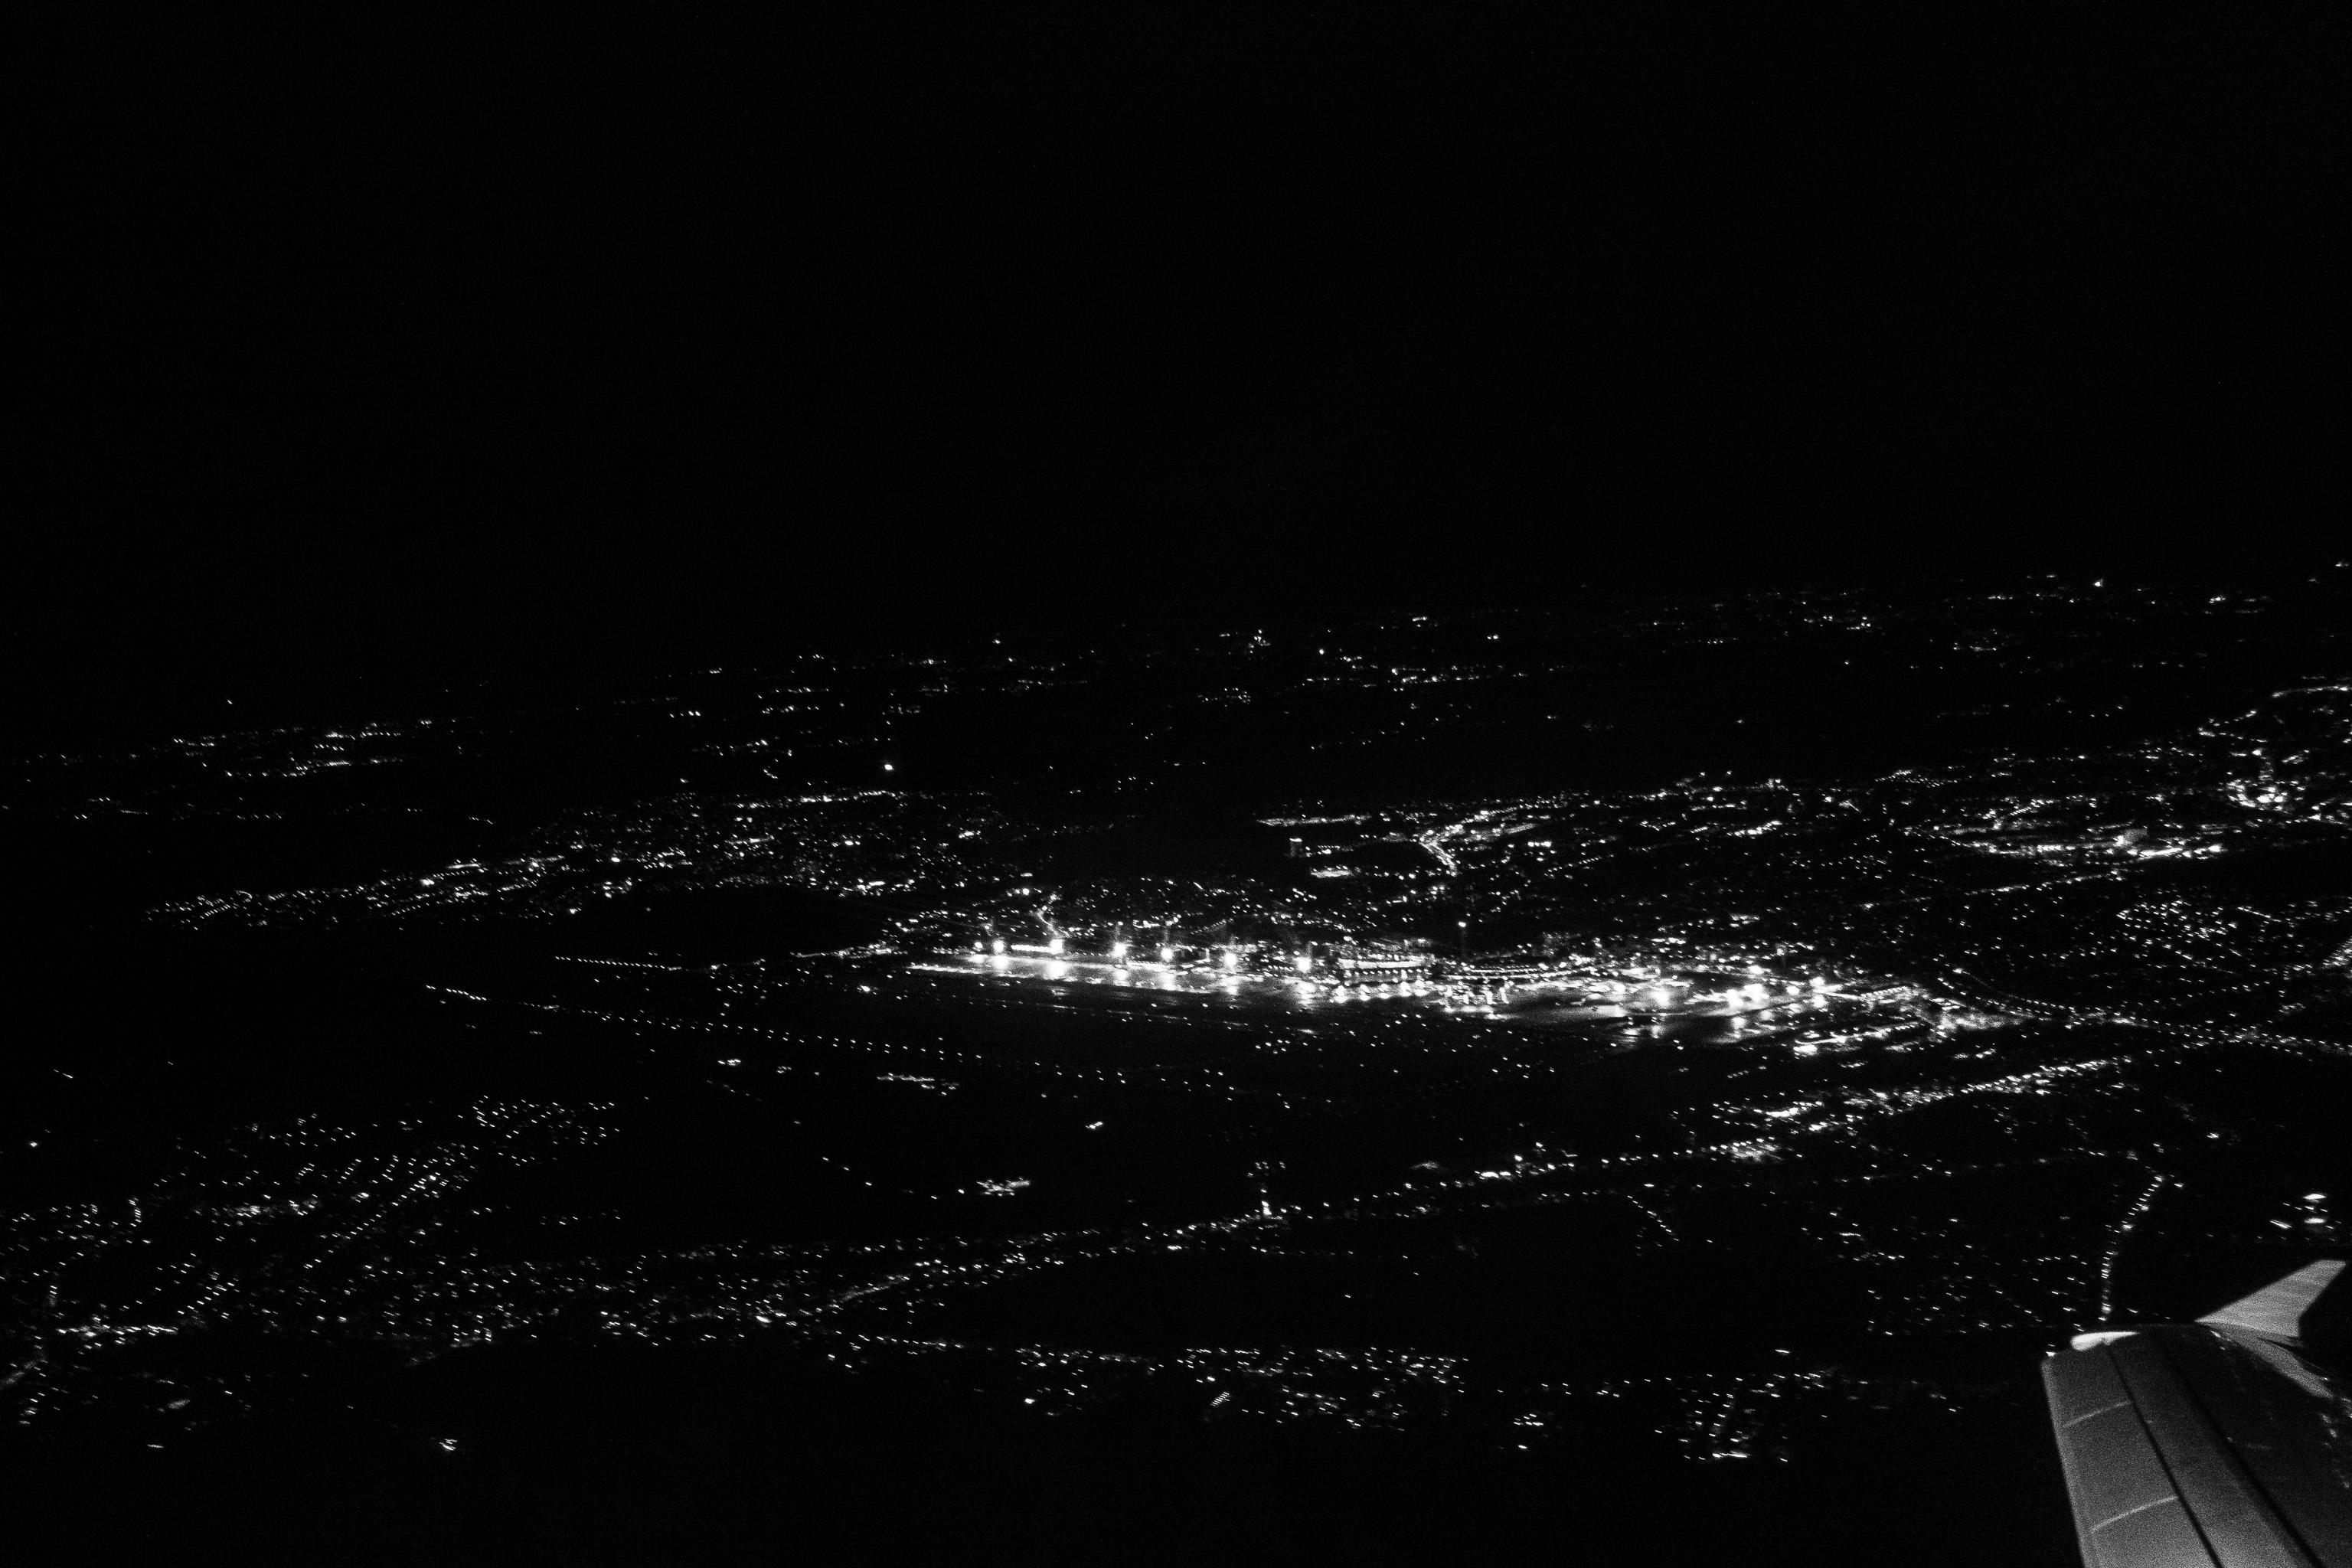 Vol de Nuit (11 von 16)